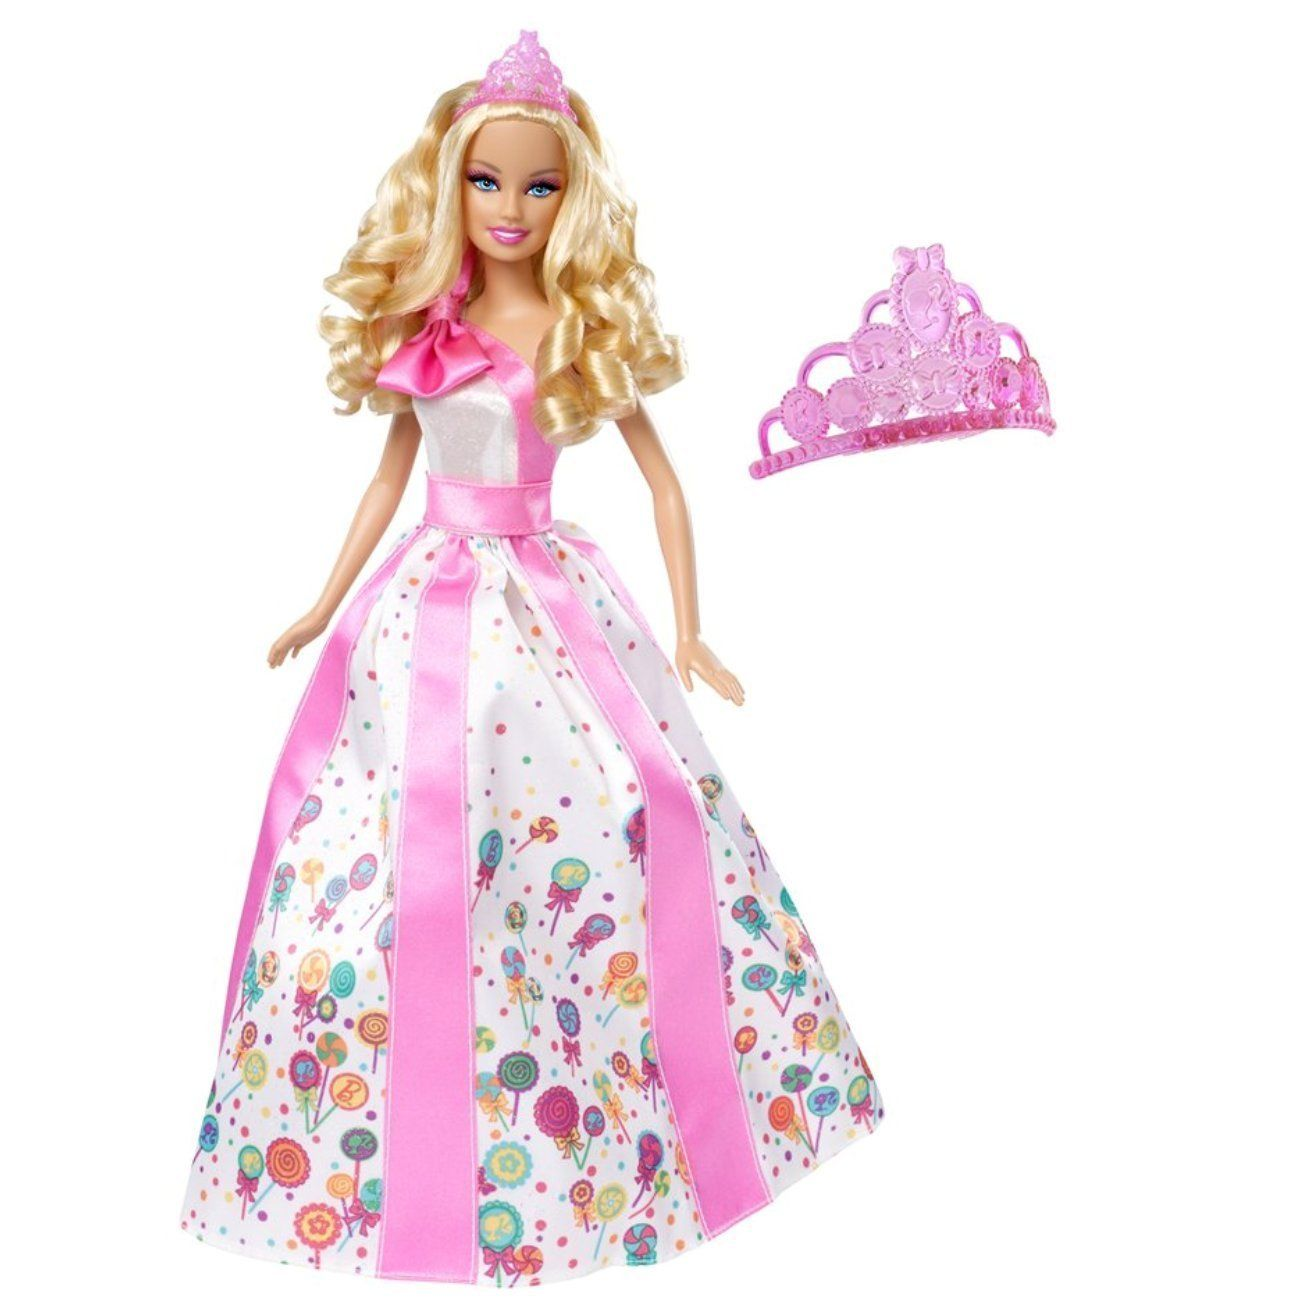 Barbie Princess Happy Birthday Doll 2010